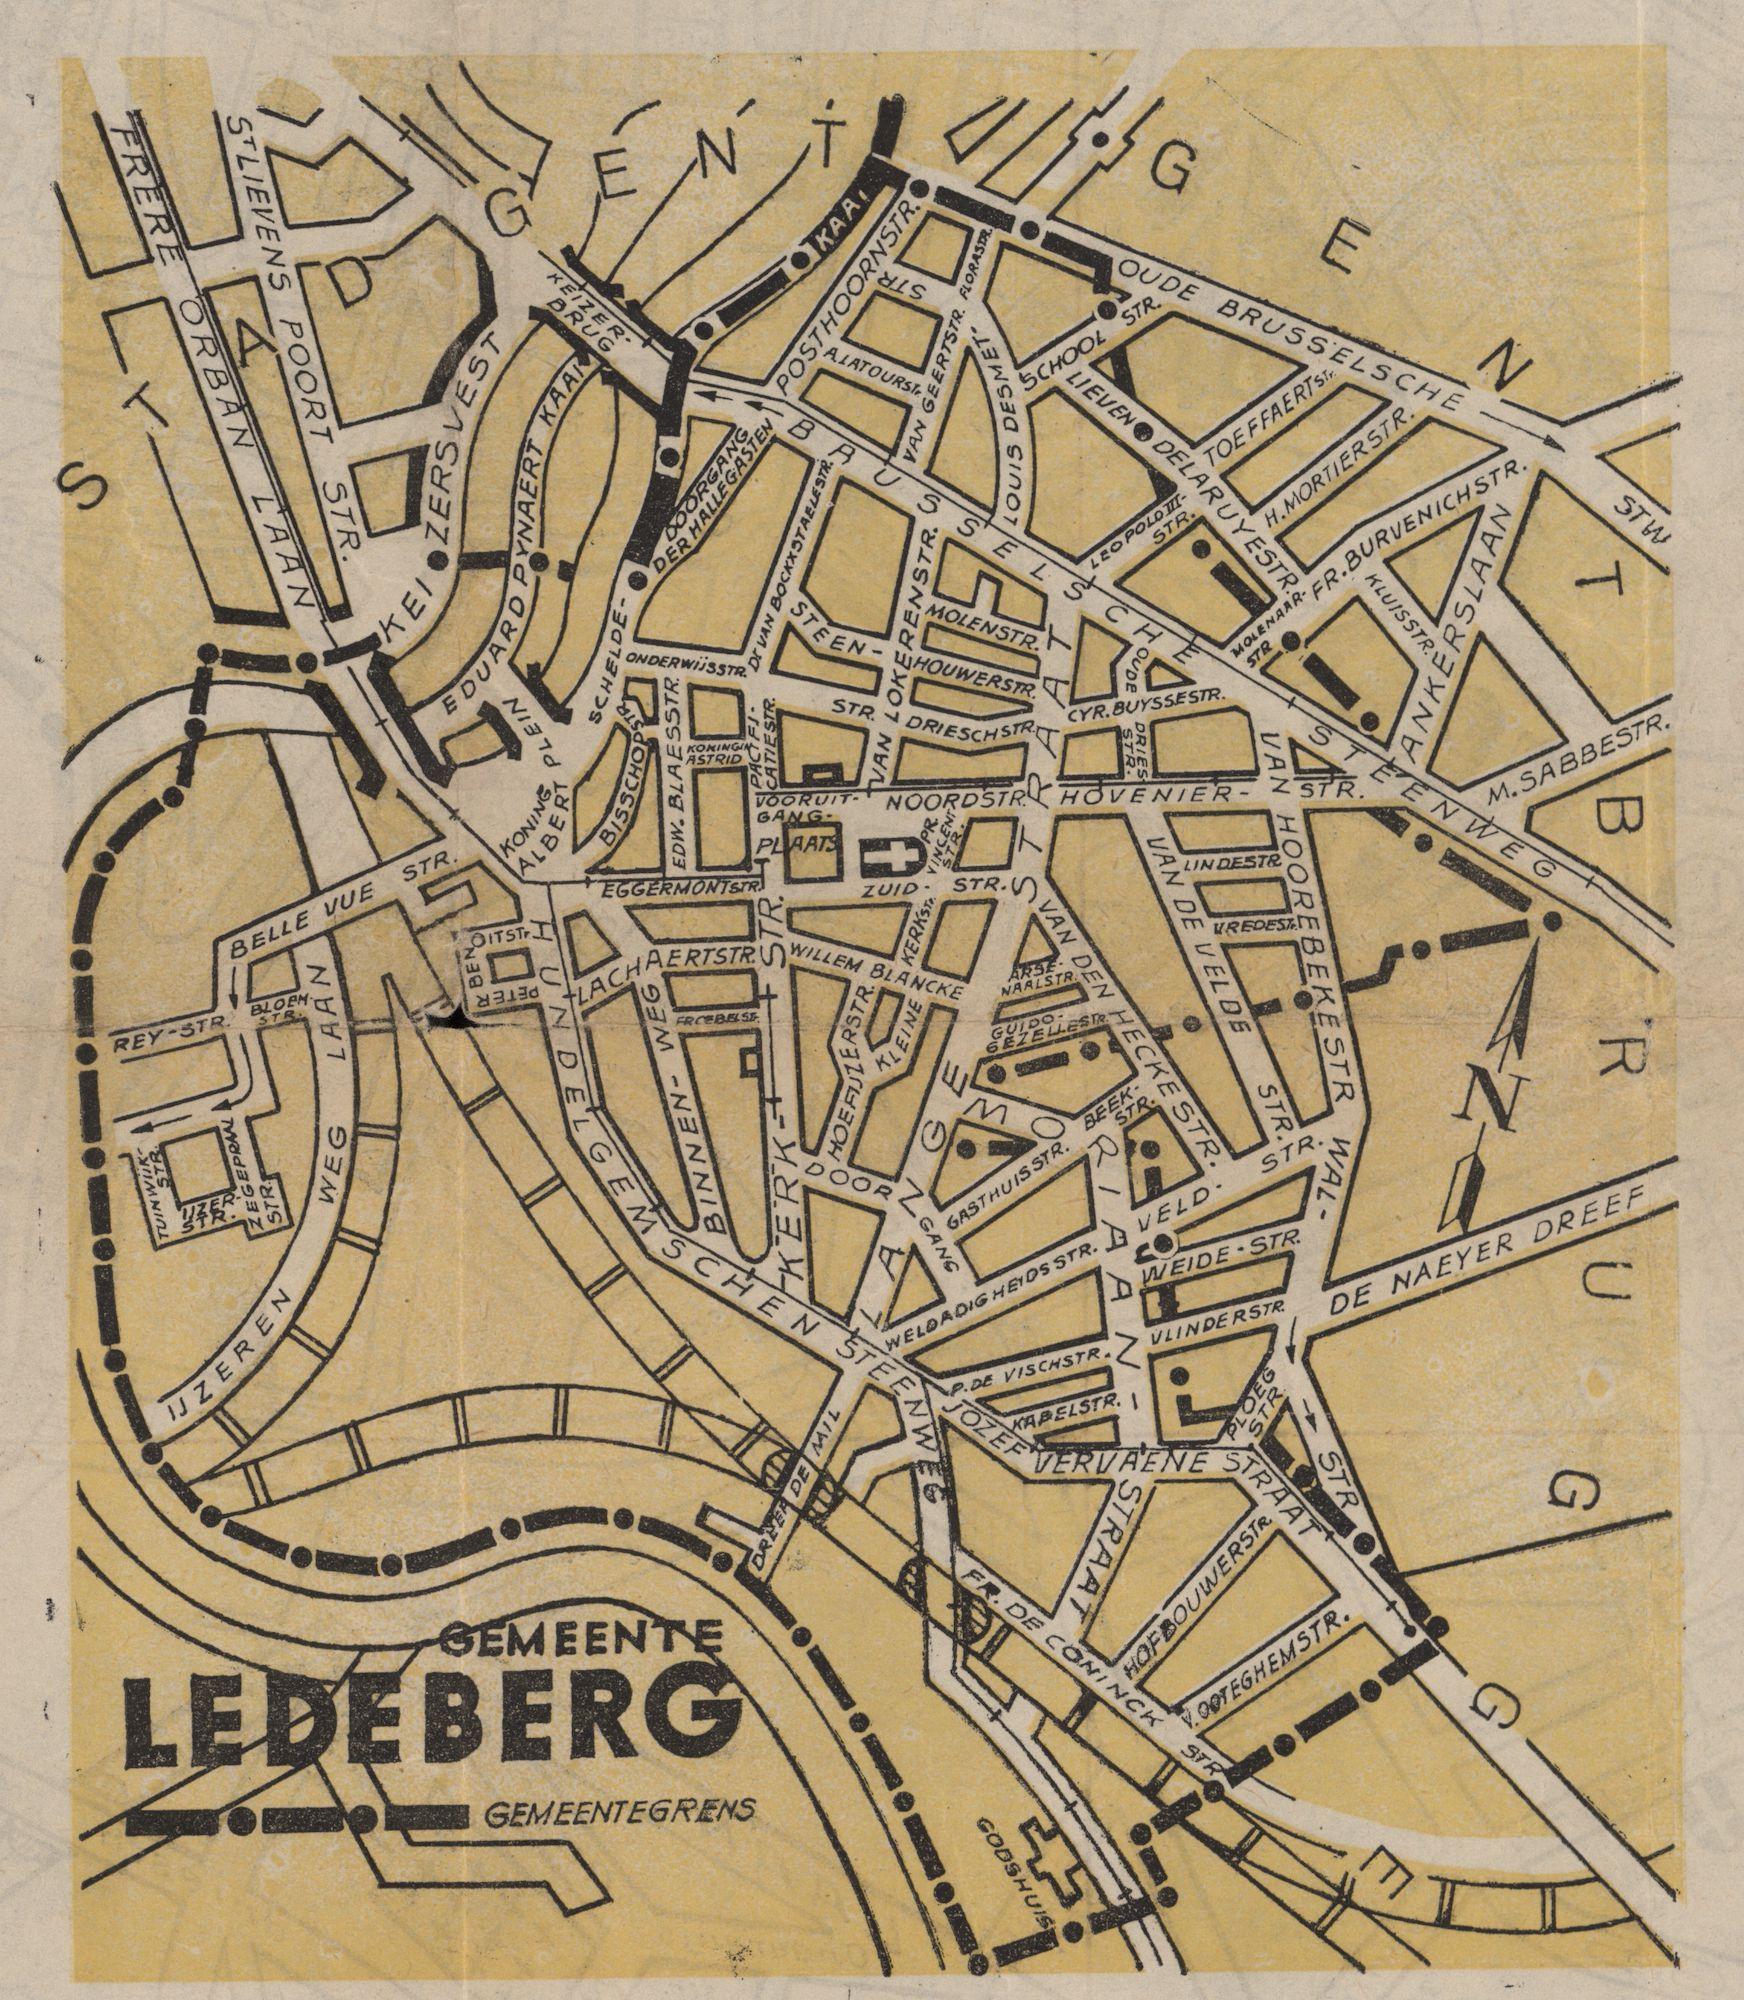 Kaart van de gemeente Ledeberg, c.1950